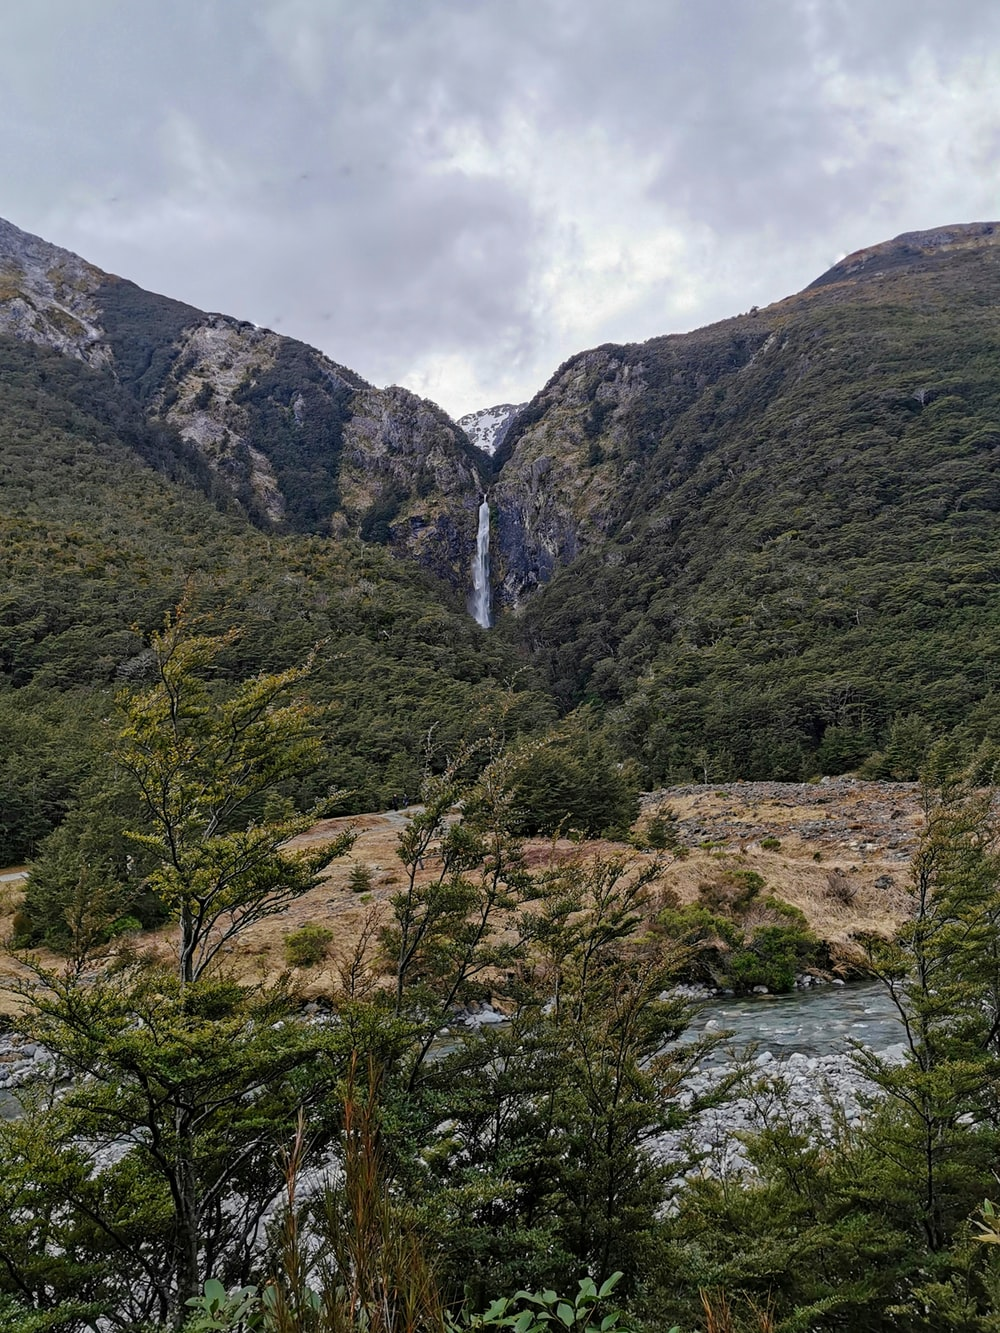 waterfall between cliffs facing trees